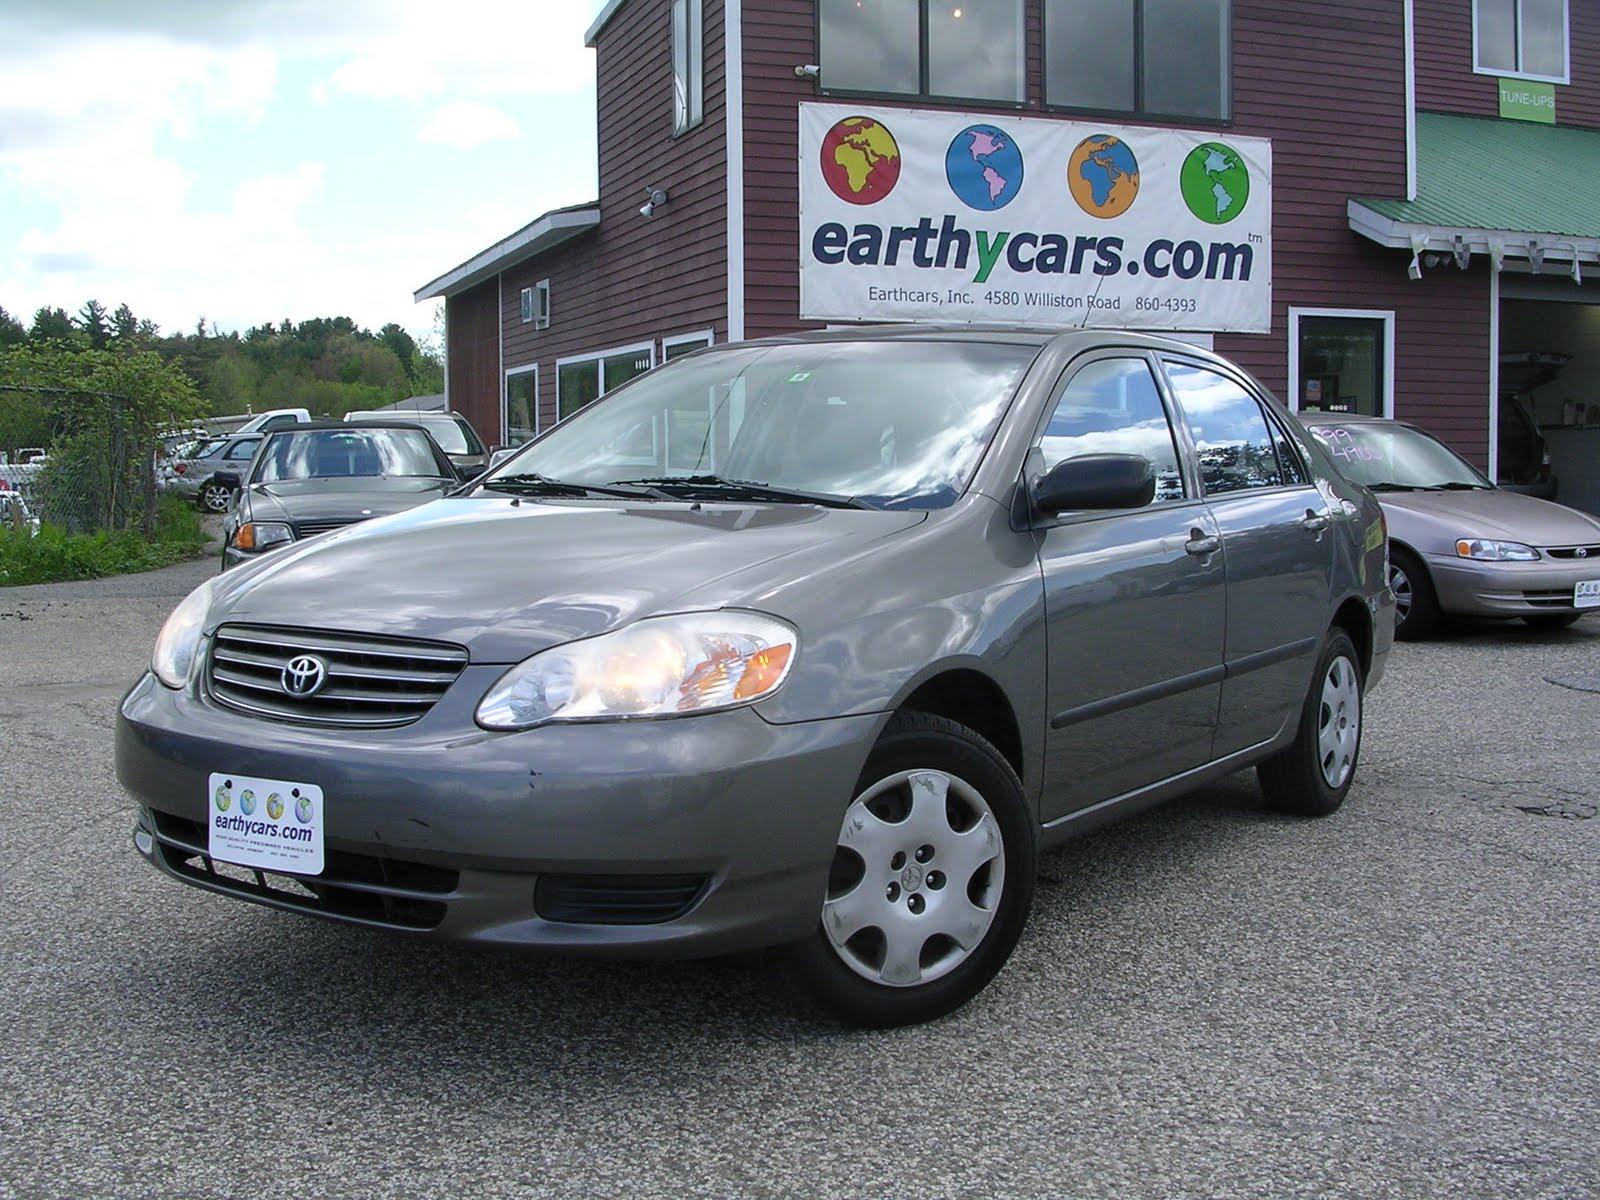 Wonderful EARTHY CAR OF THE WEEK: 2003 Grey Toyota Corolla CE